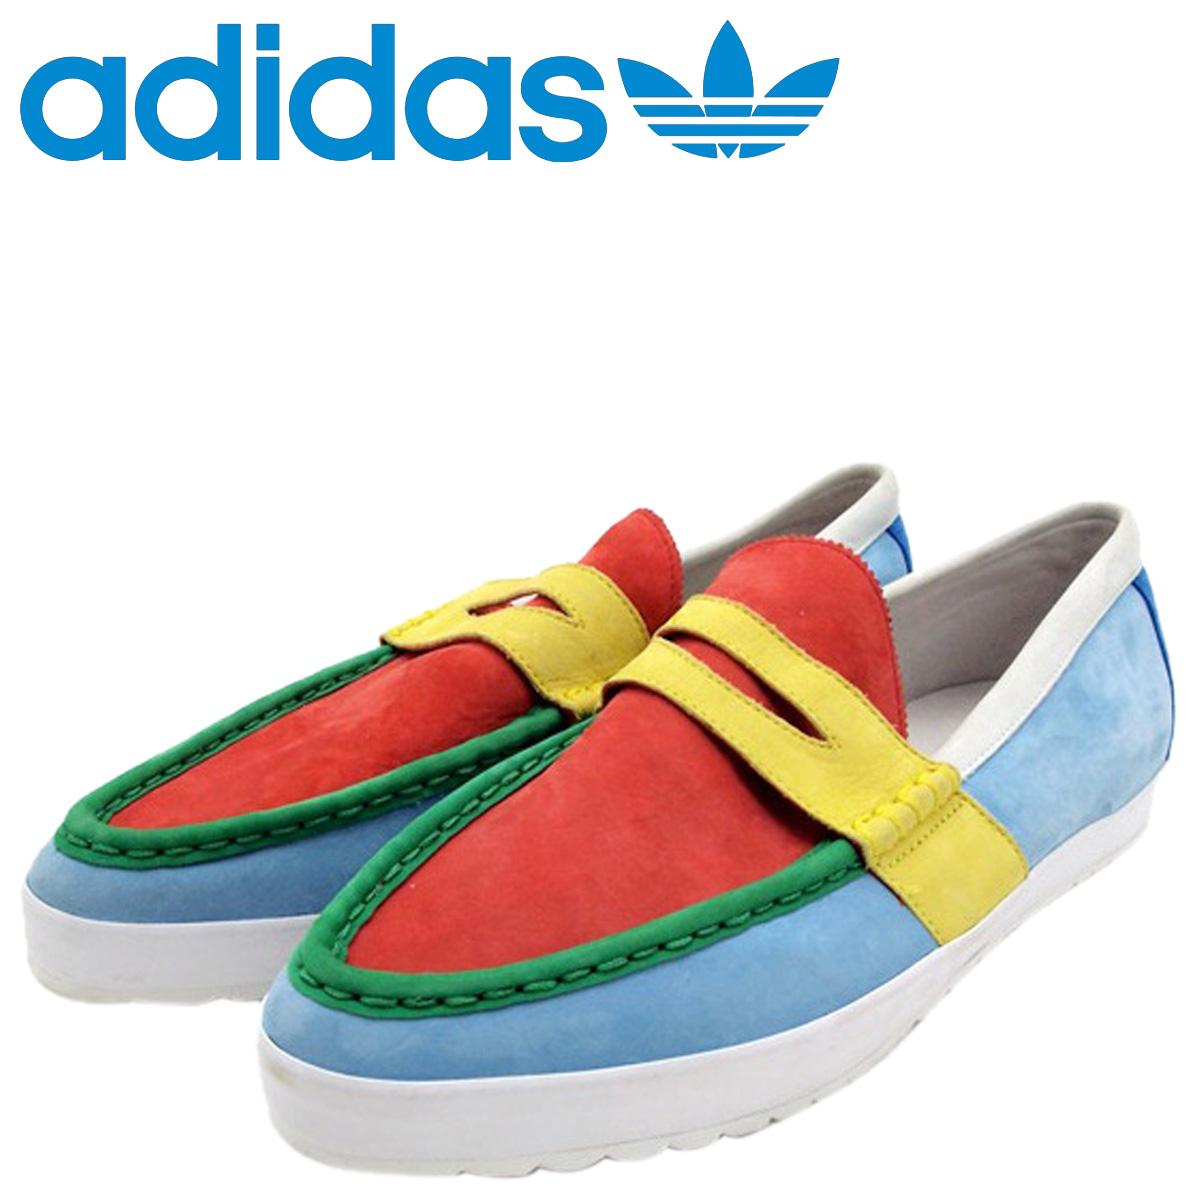 adidas Originals アディダス オリジナルス ペニーローファー ジェレミースコット OBYO JEREMY SCOTT PENNY LOAFER SLIM V22822 メンズ レディース